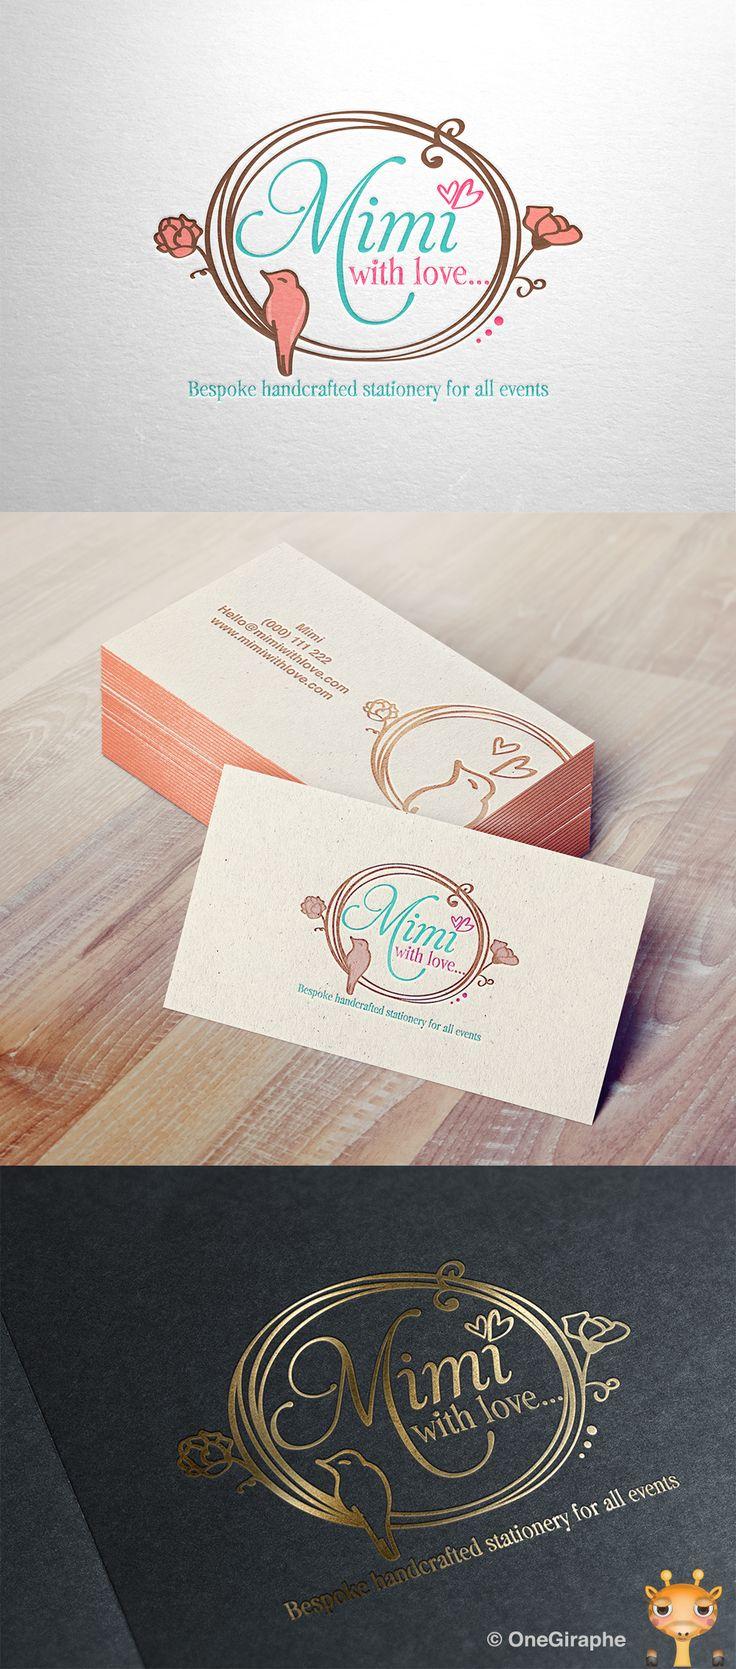 #logo #logodesign #design #behance #logopond #brandstack #logostore #graphic #brand #handmade #handcrafted #crafts #bird #birds #flower #cute #sweet